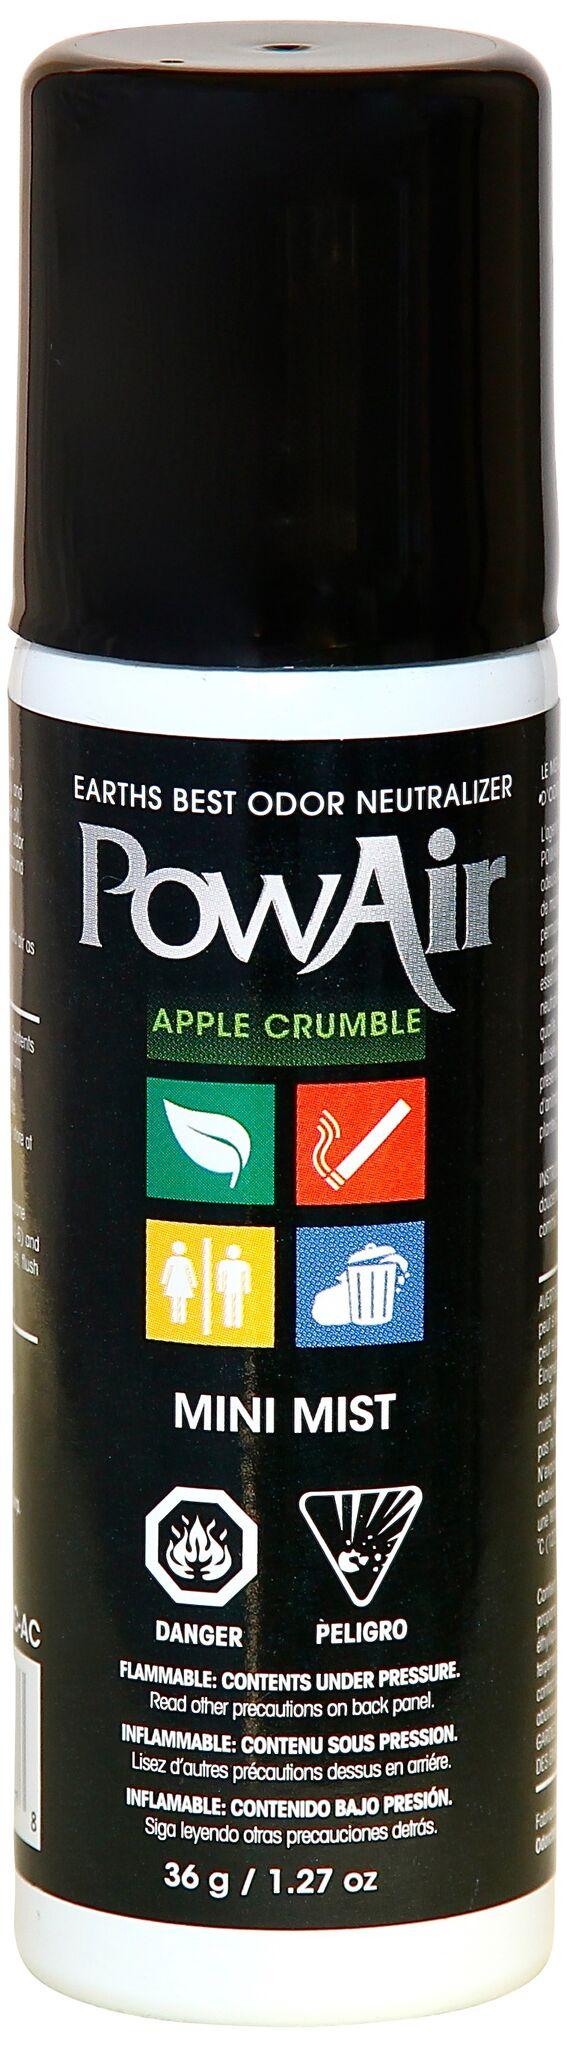 Powair Minimist Apple Crumble 36g